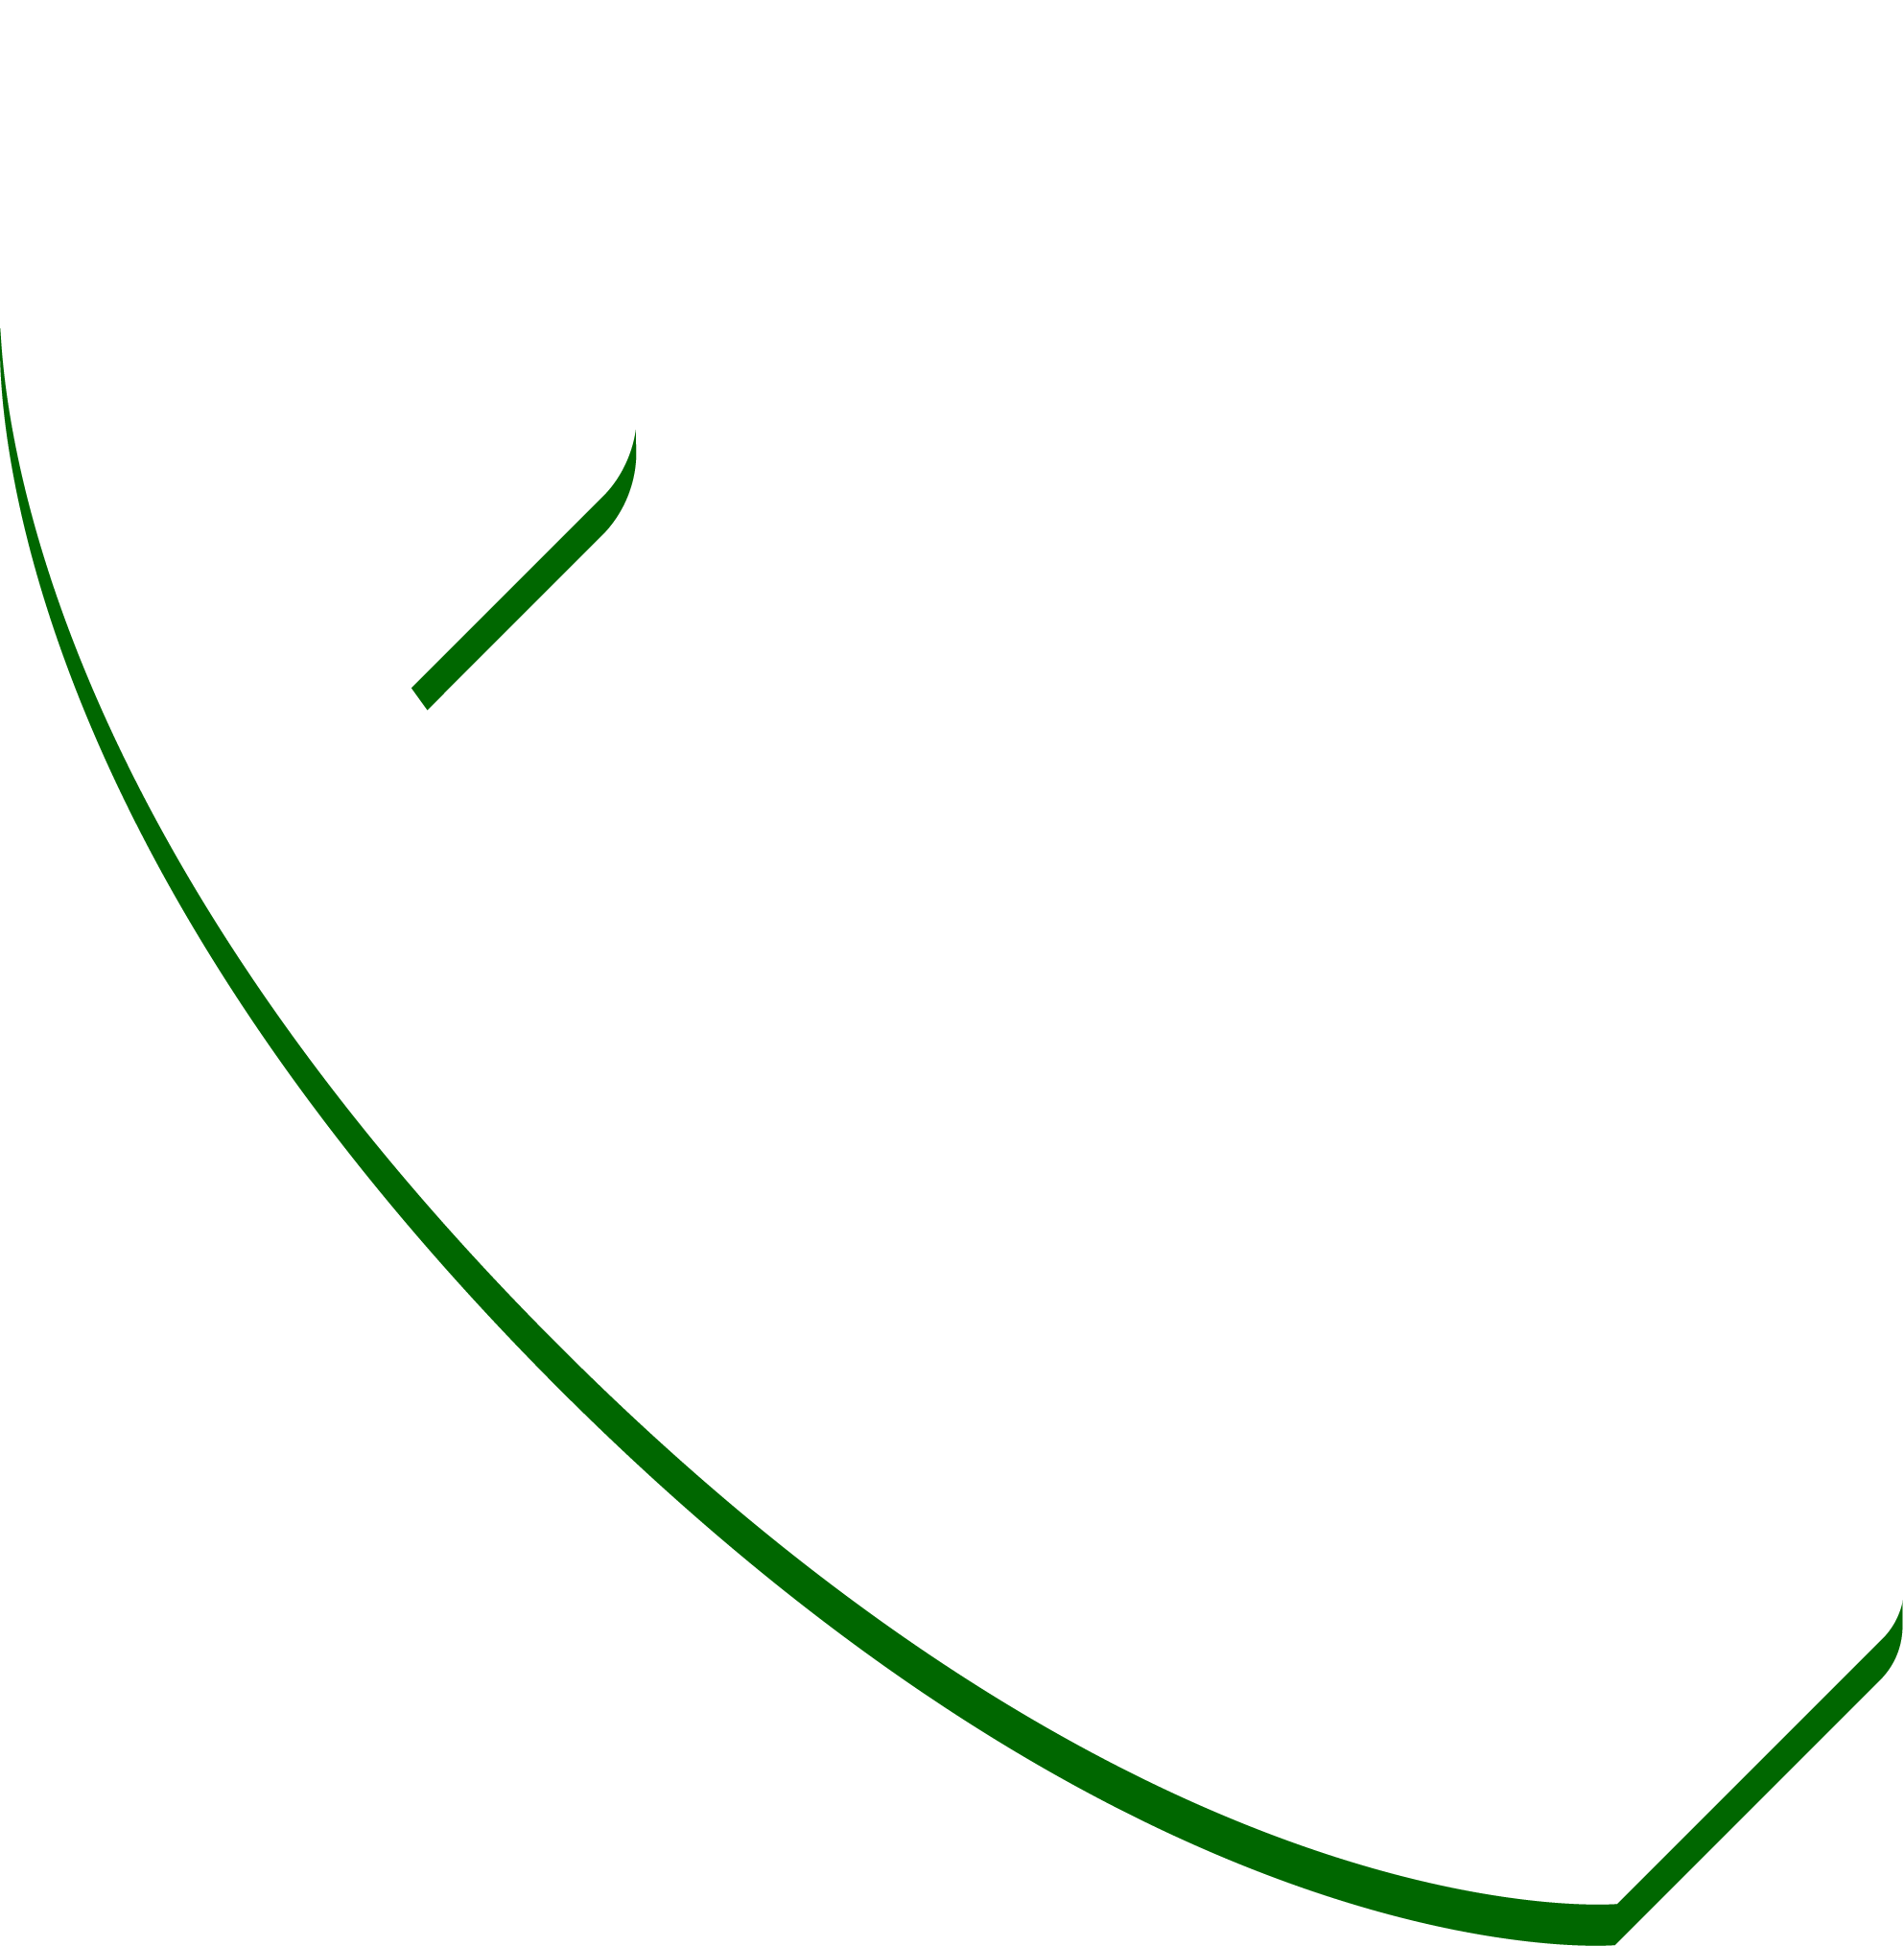 Hotline 0901986888